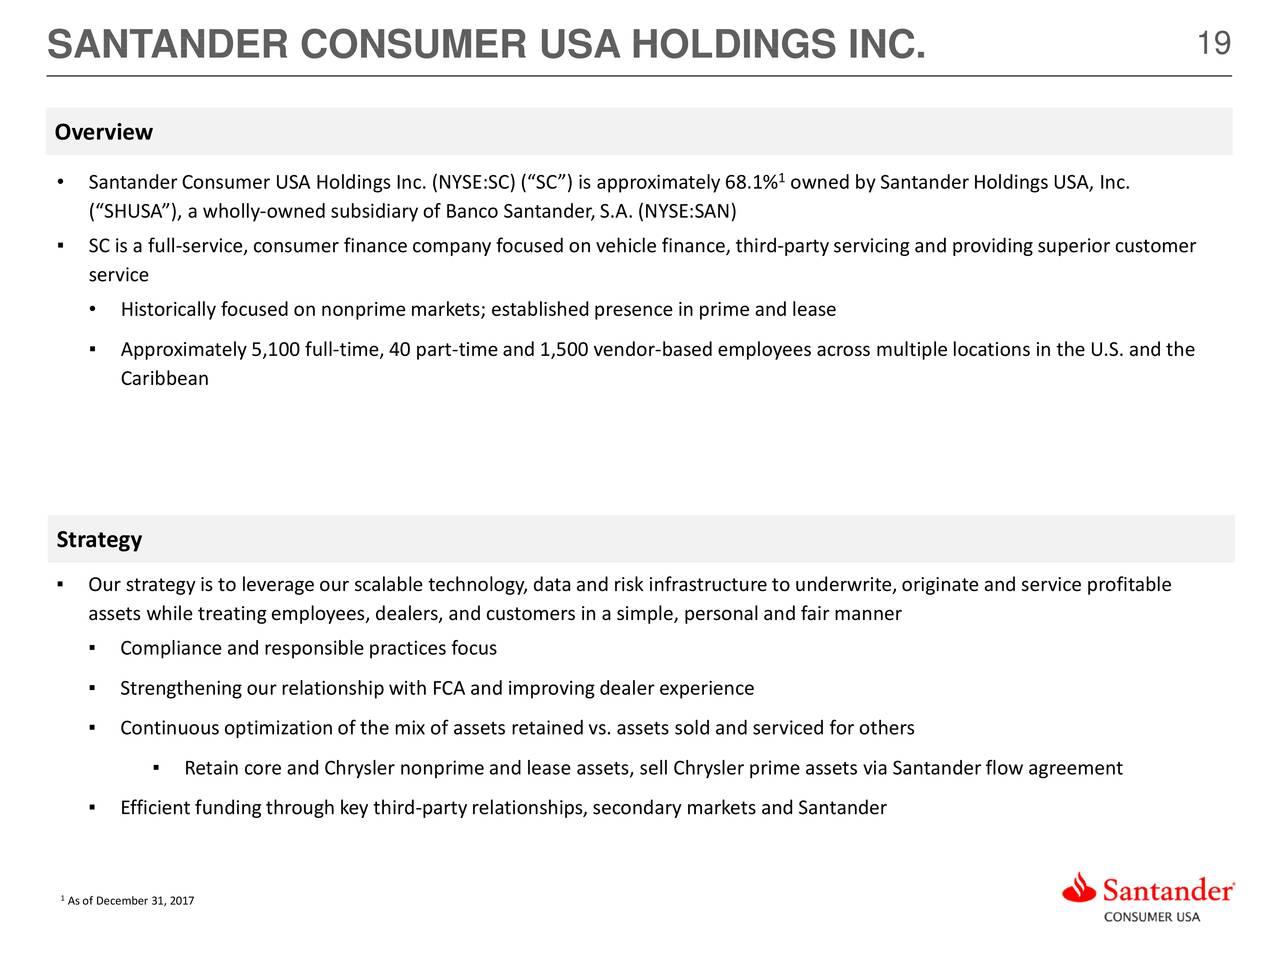 Santander Consumer USA Holdings Inc 2017 Q4